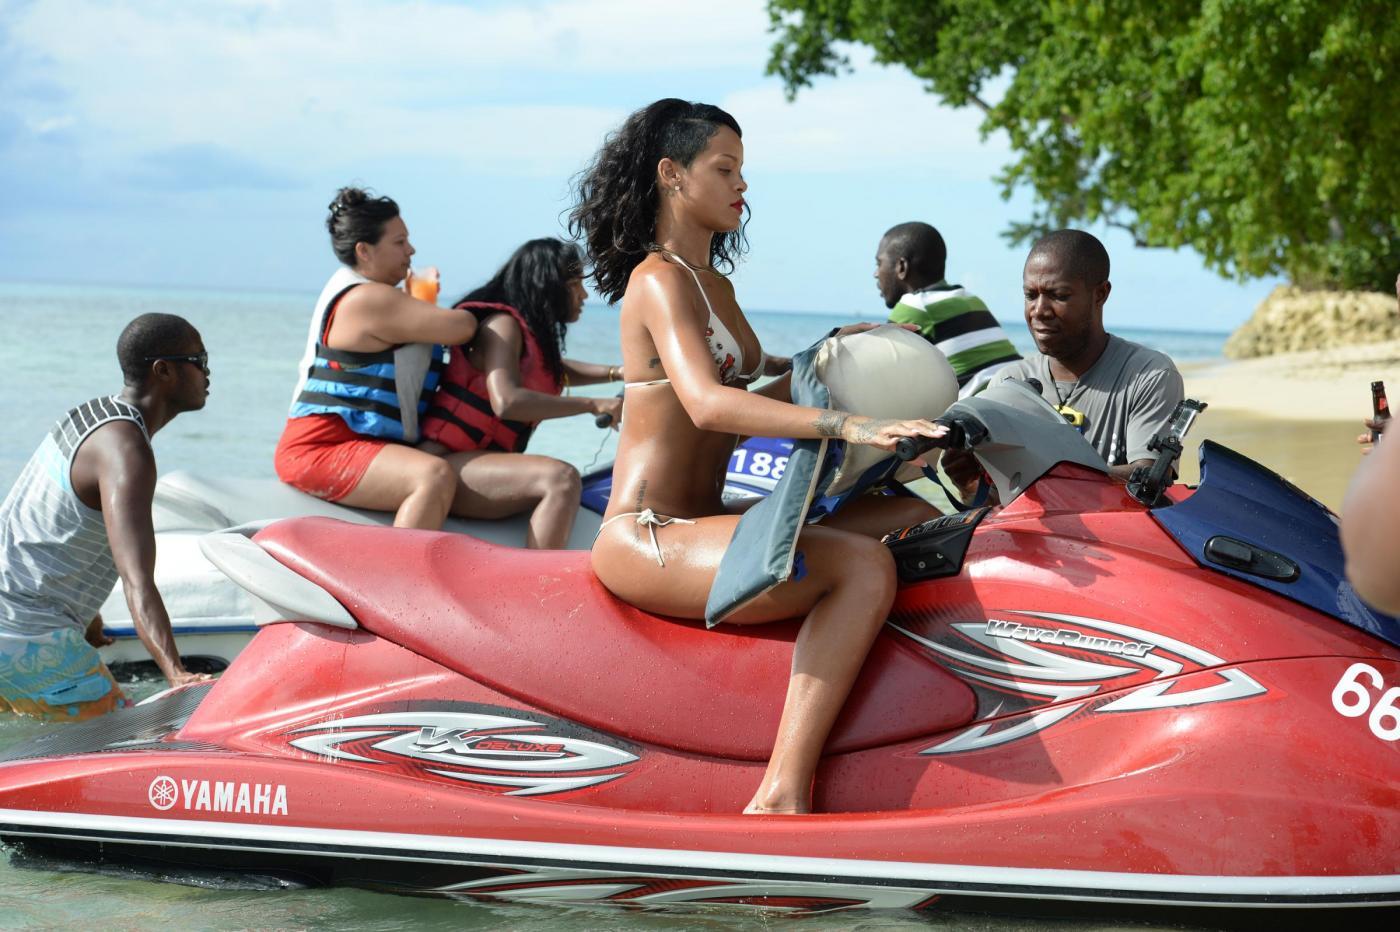 Rihanna al mare alle Barbados: guarda tutti i suoi tatuaggi 07